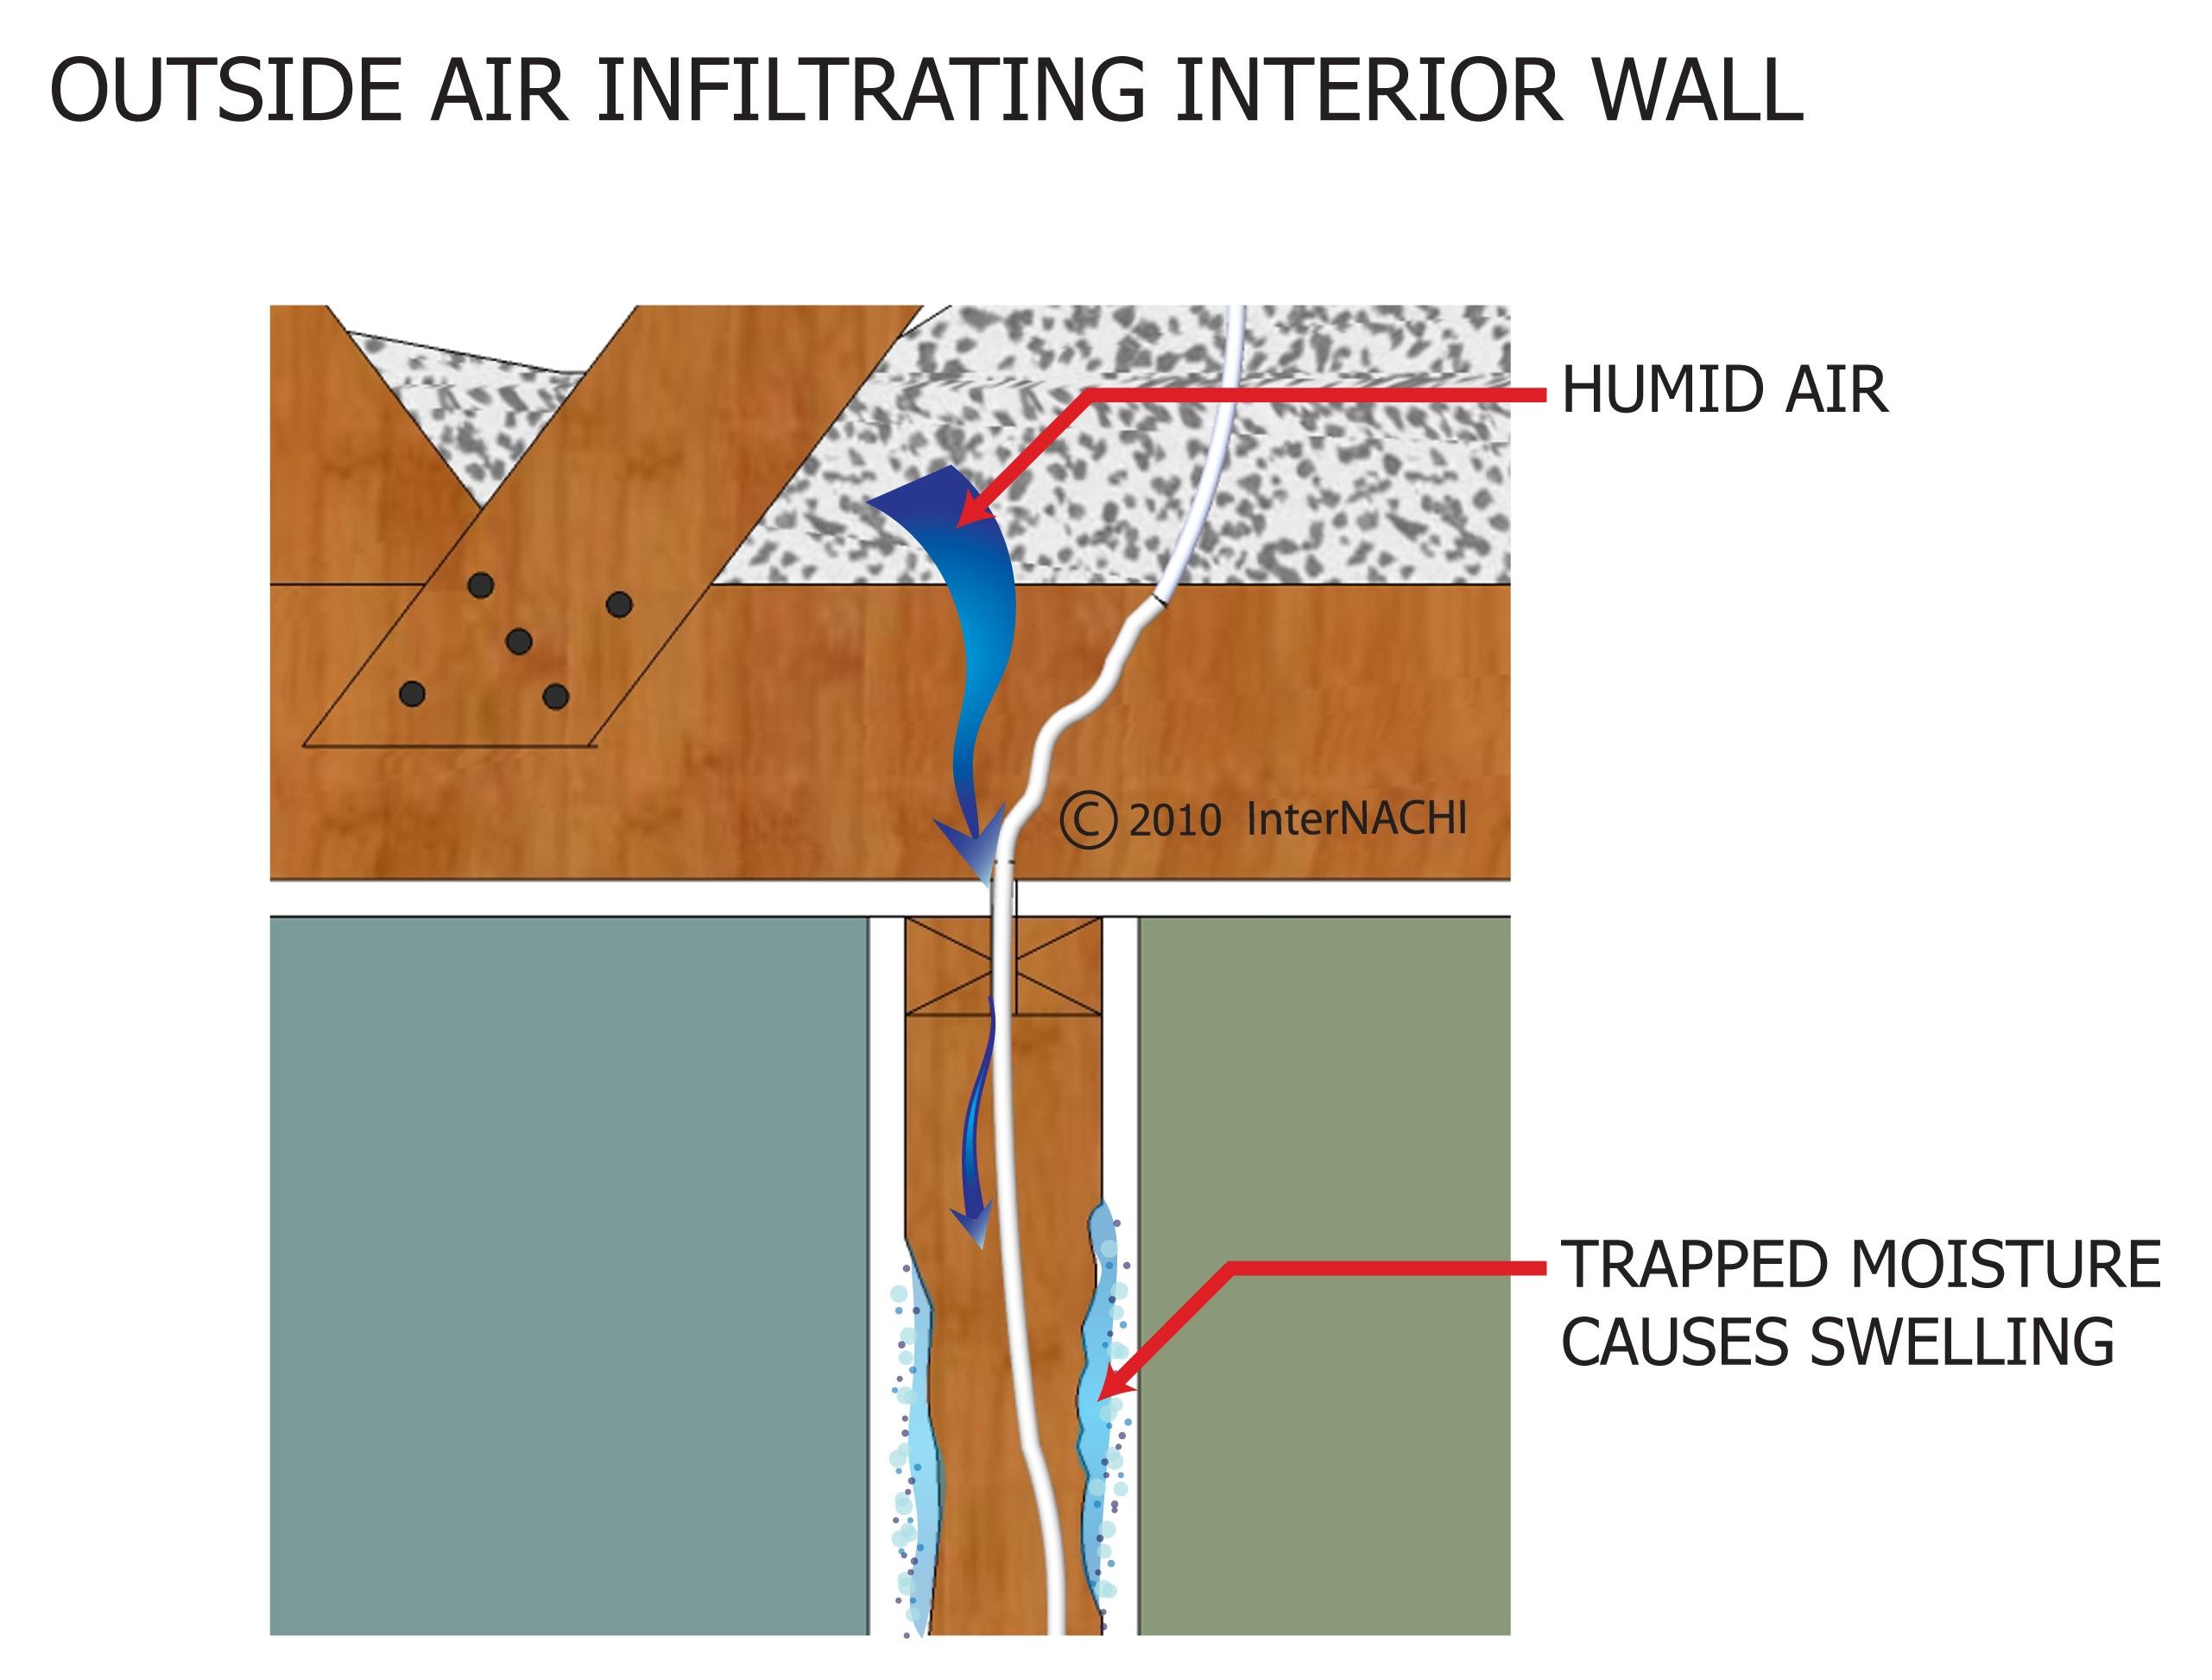 Outside air infiltrating interior wall.